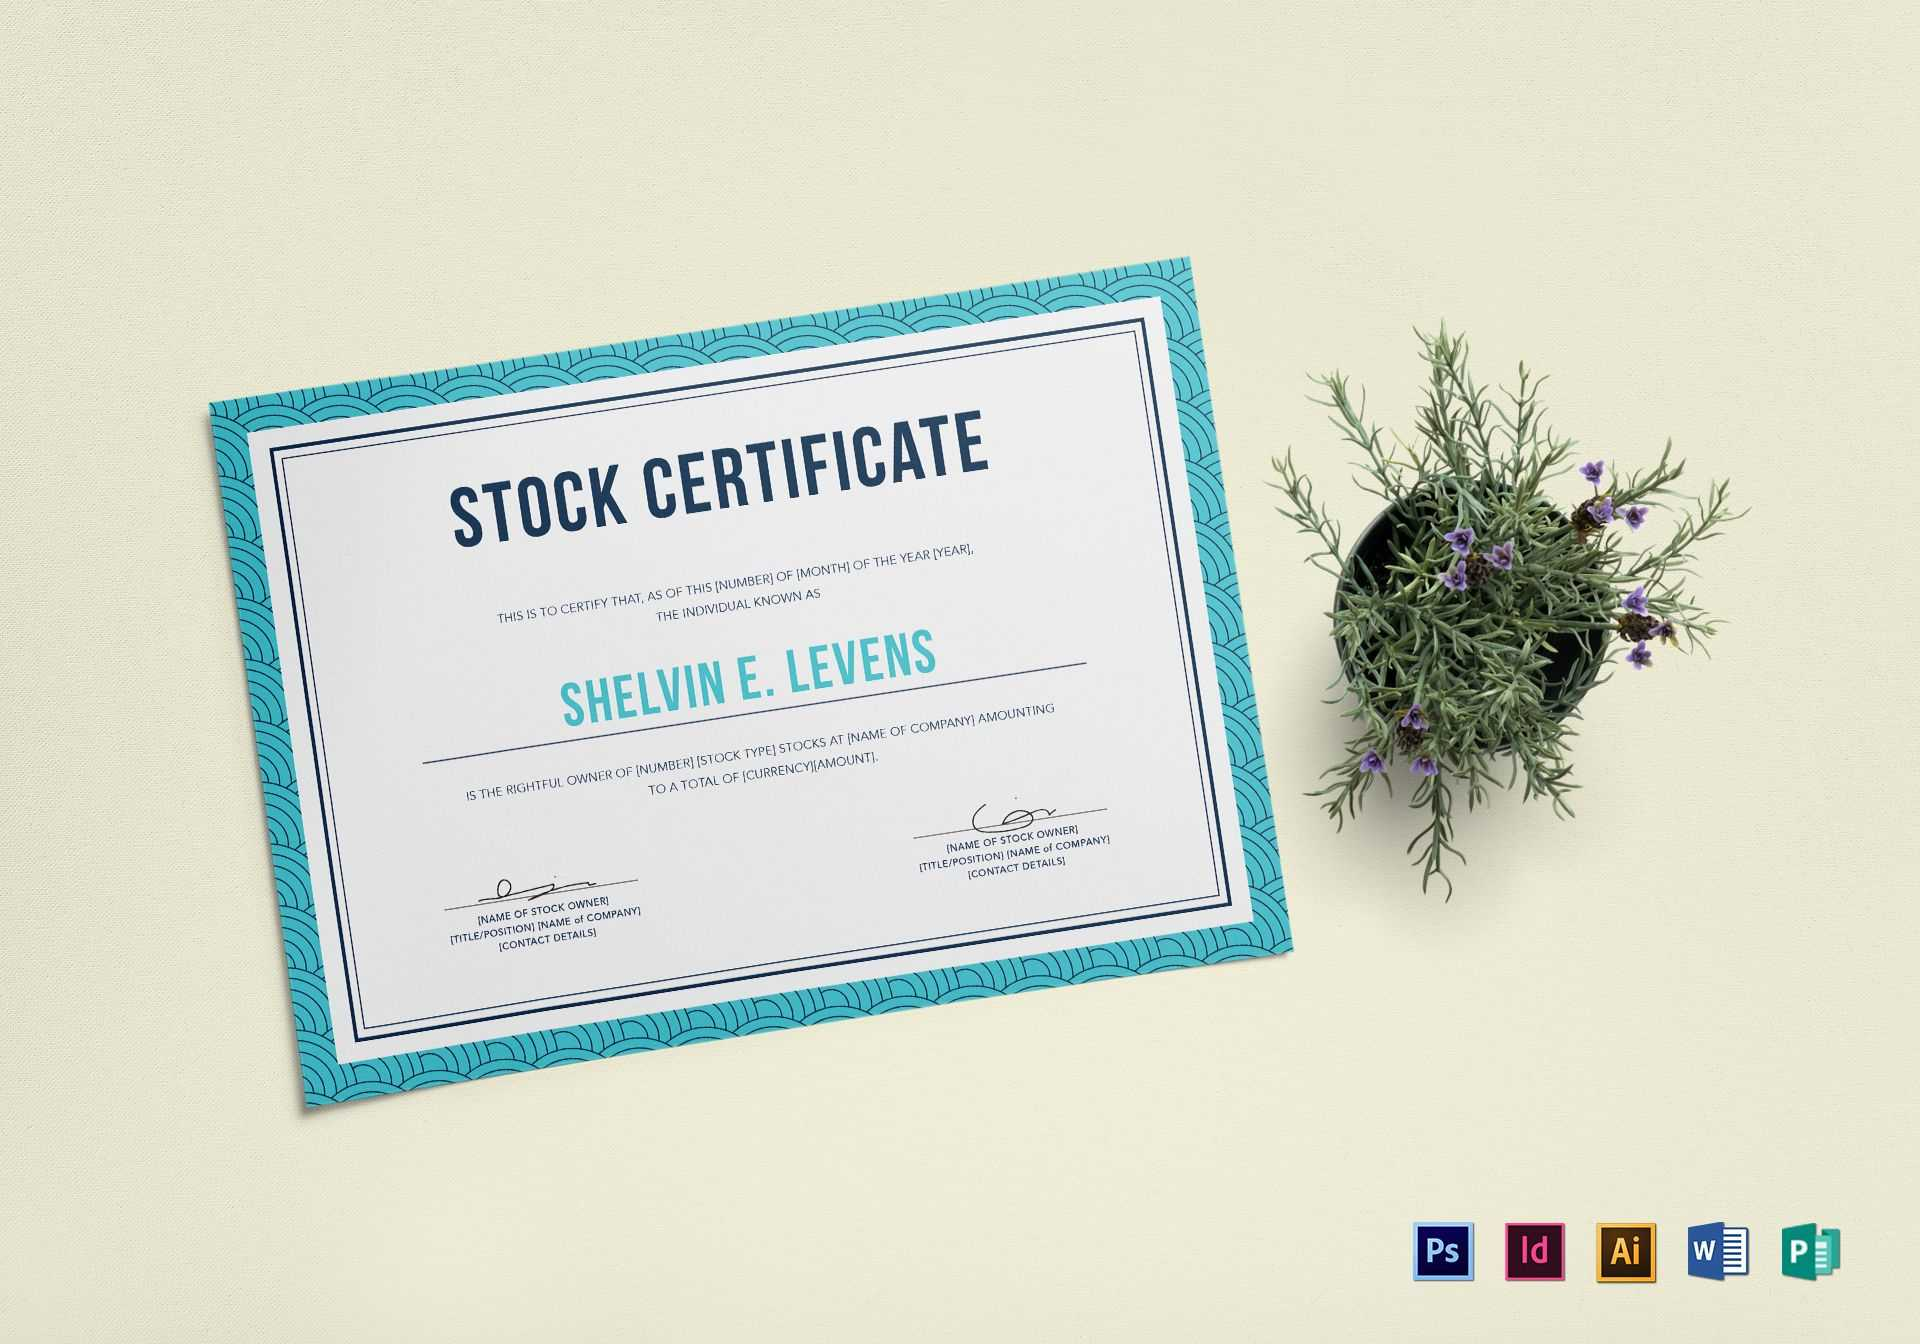 Stock Certificate Template Regarding Stock Certificate Template Word